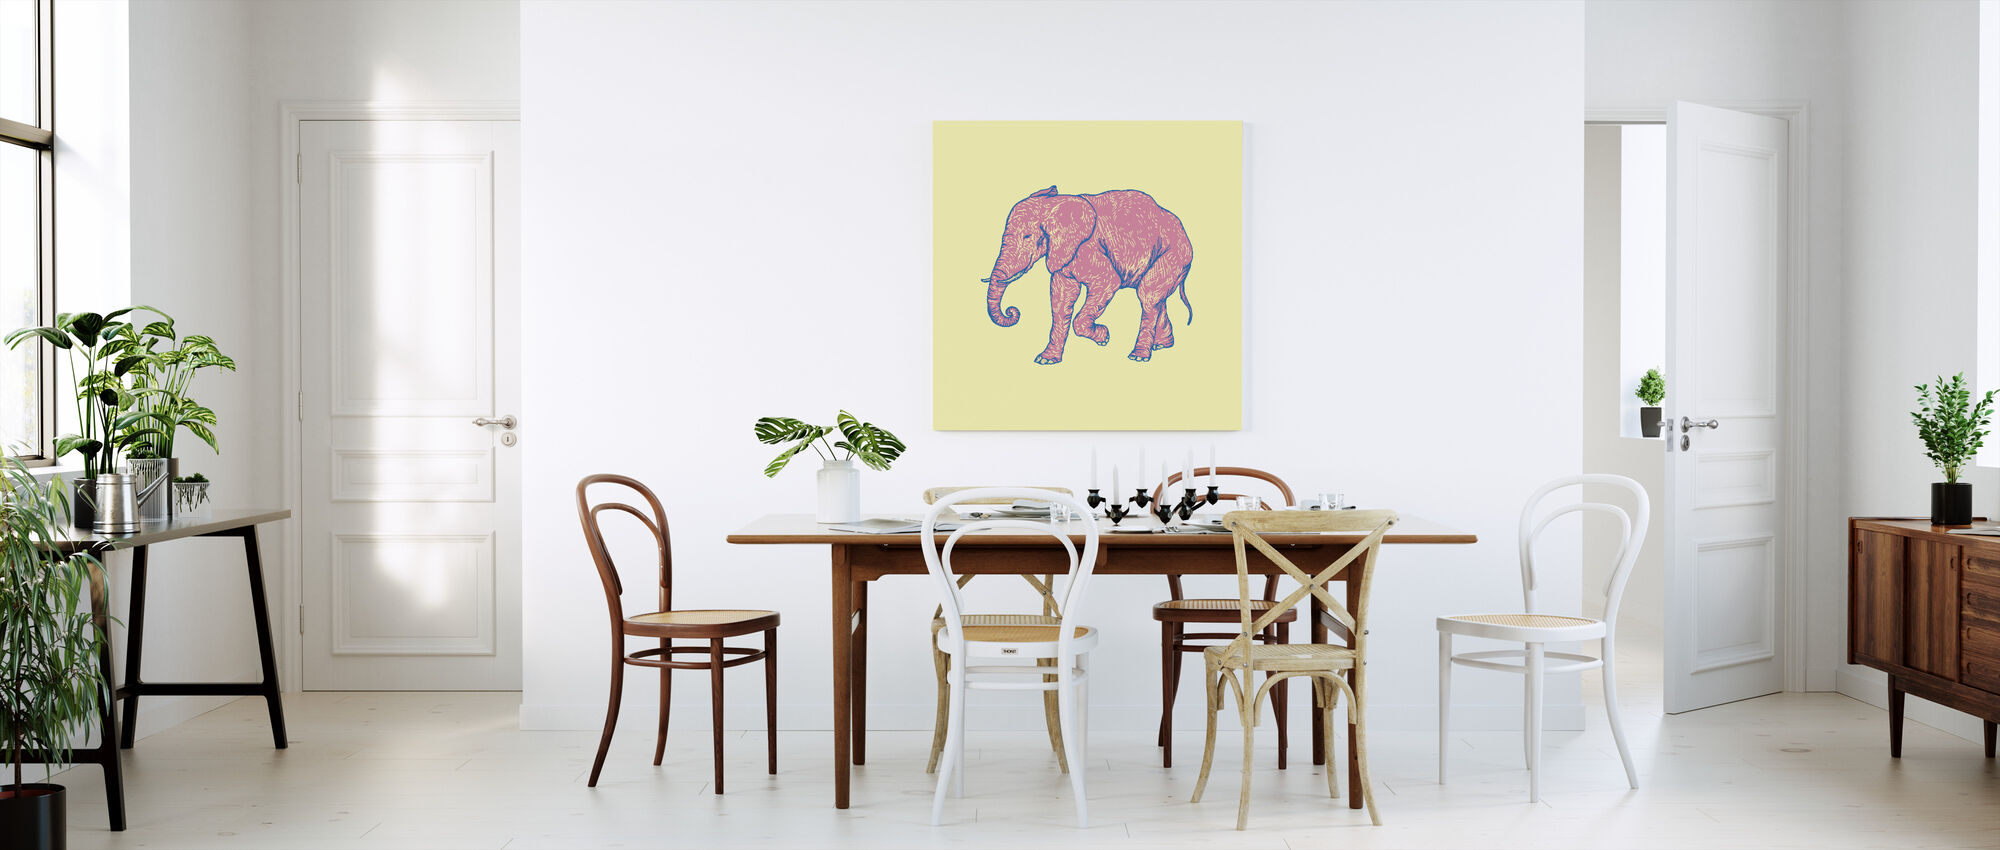 Olifant Gelukkig - Canvas print - Keuken